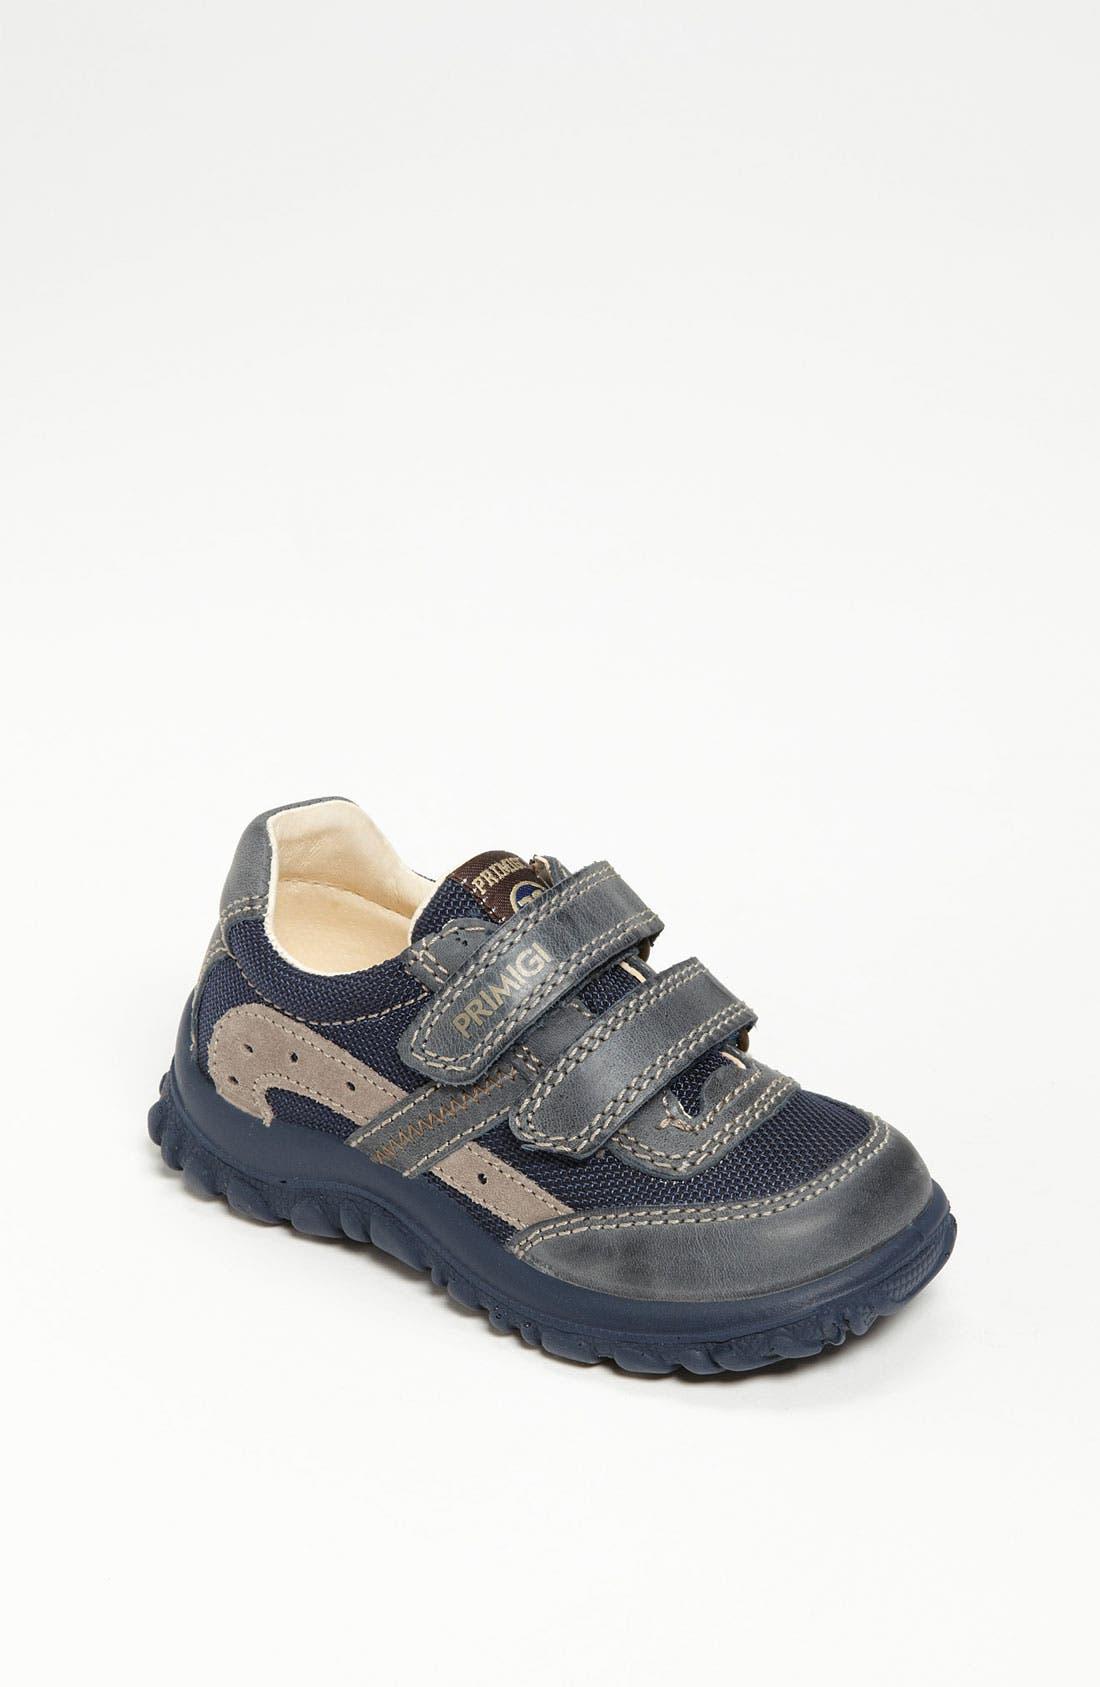 Alternate Image 1 Selected - Primigi 'Charan' Sneaker (Walker, Toddler & Little Kid)